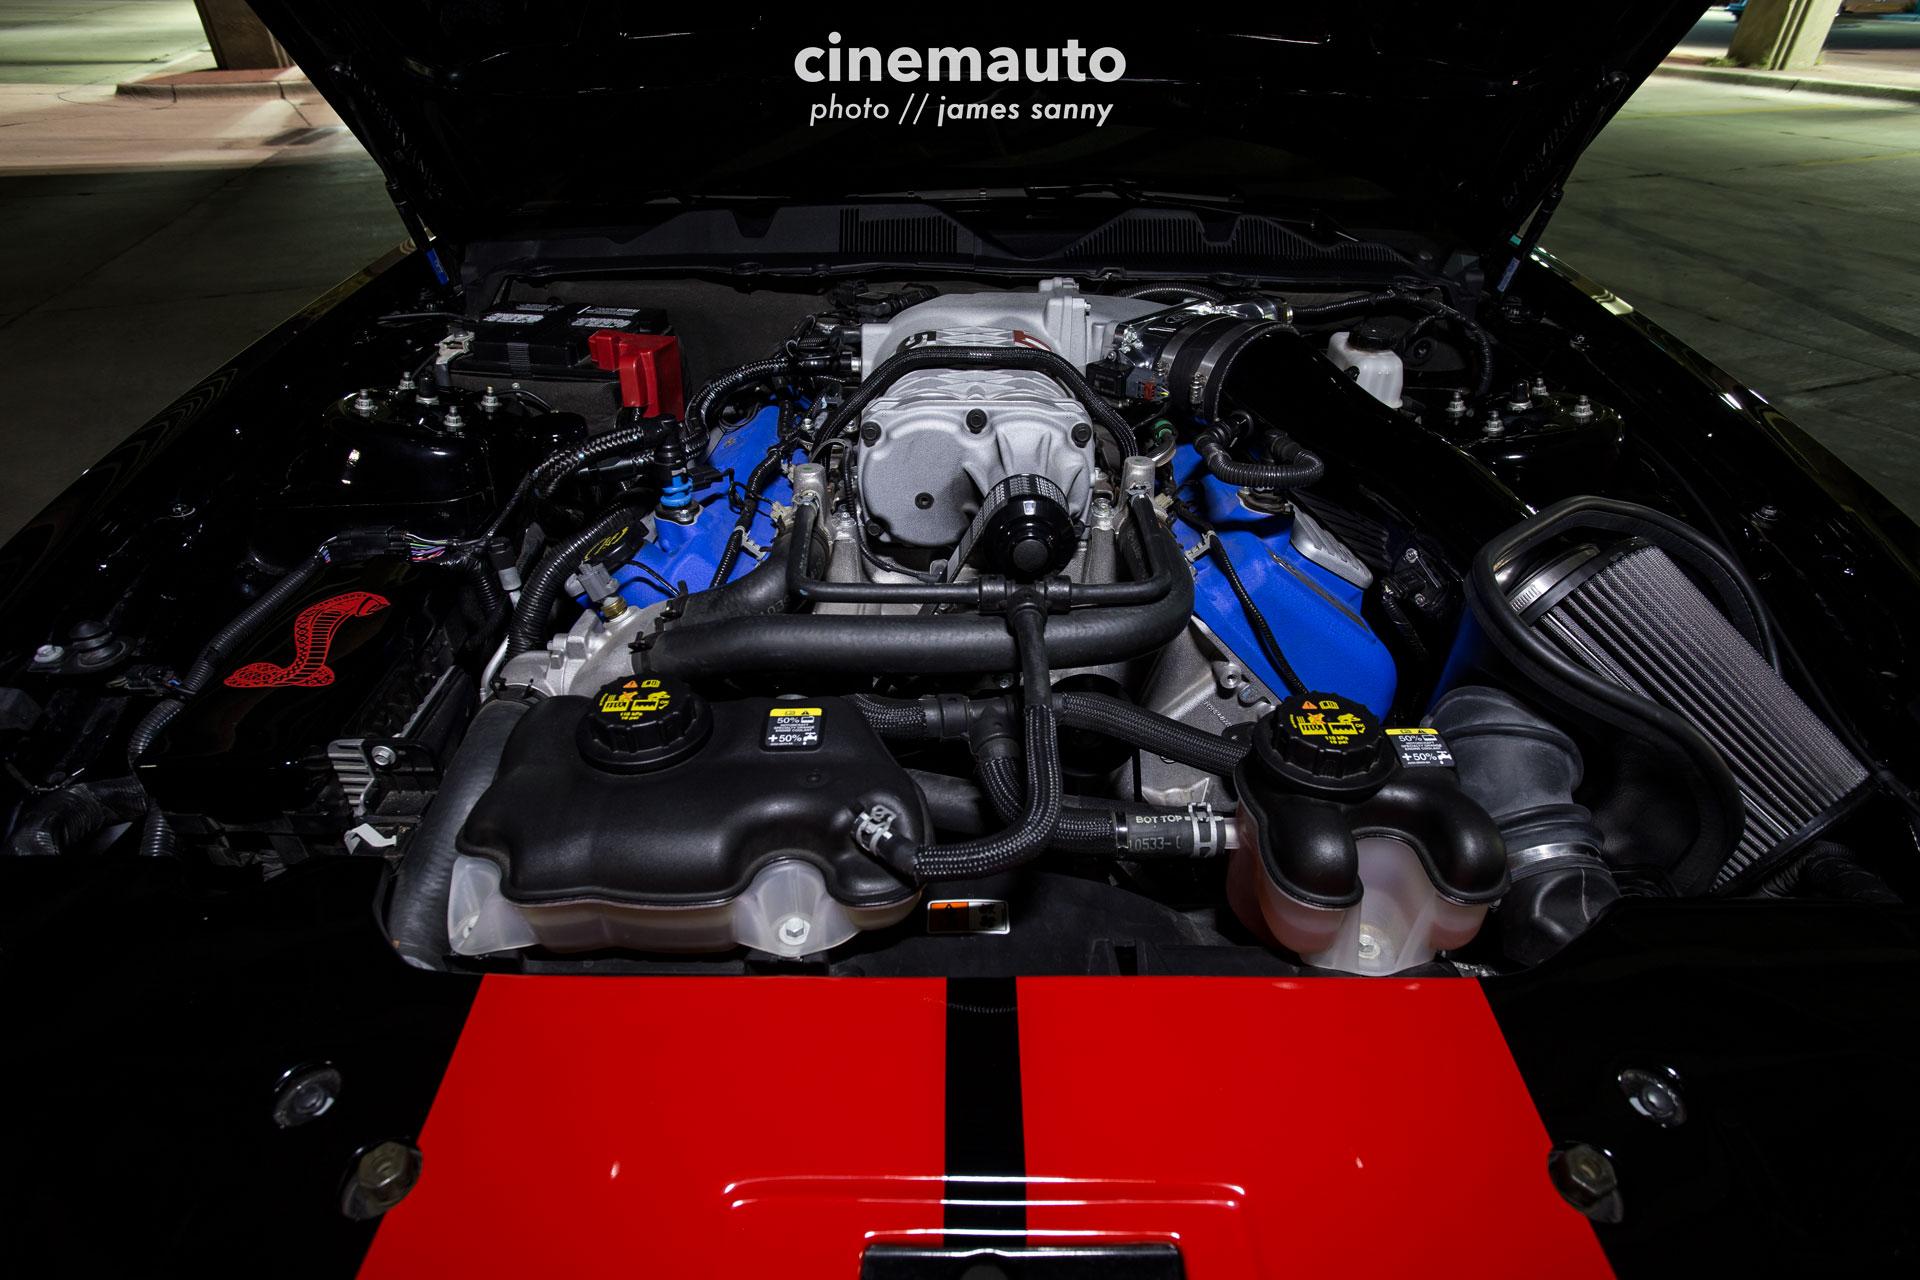 cinemauto-wichita-autmotive-photography-cj20a.jpg